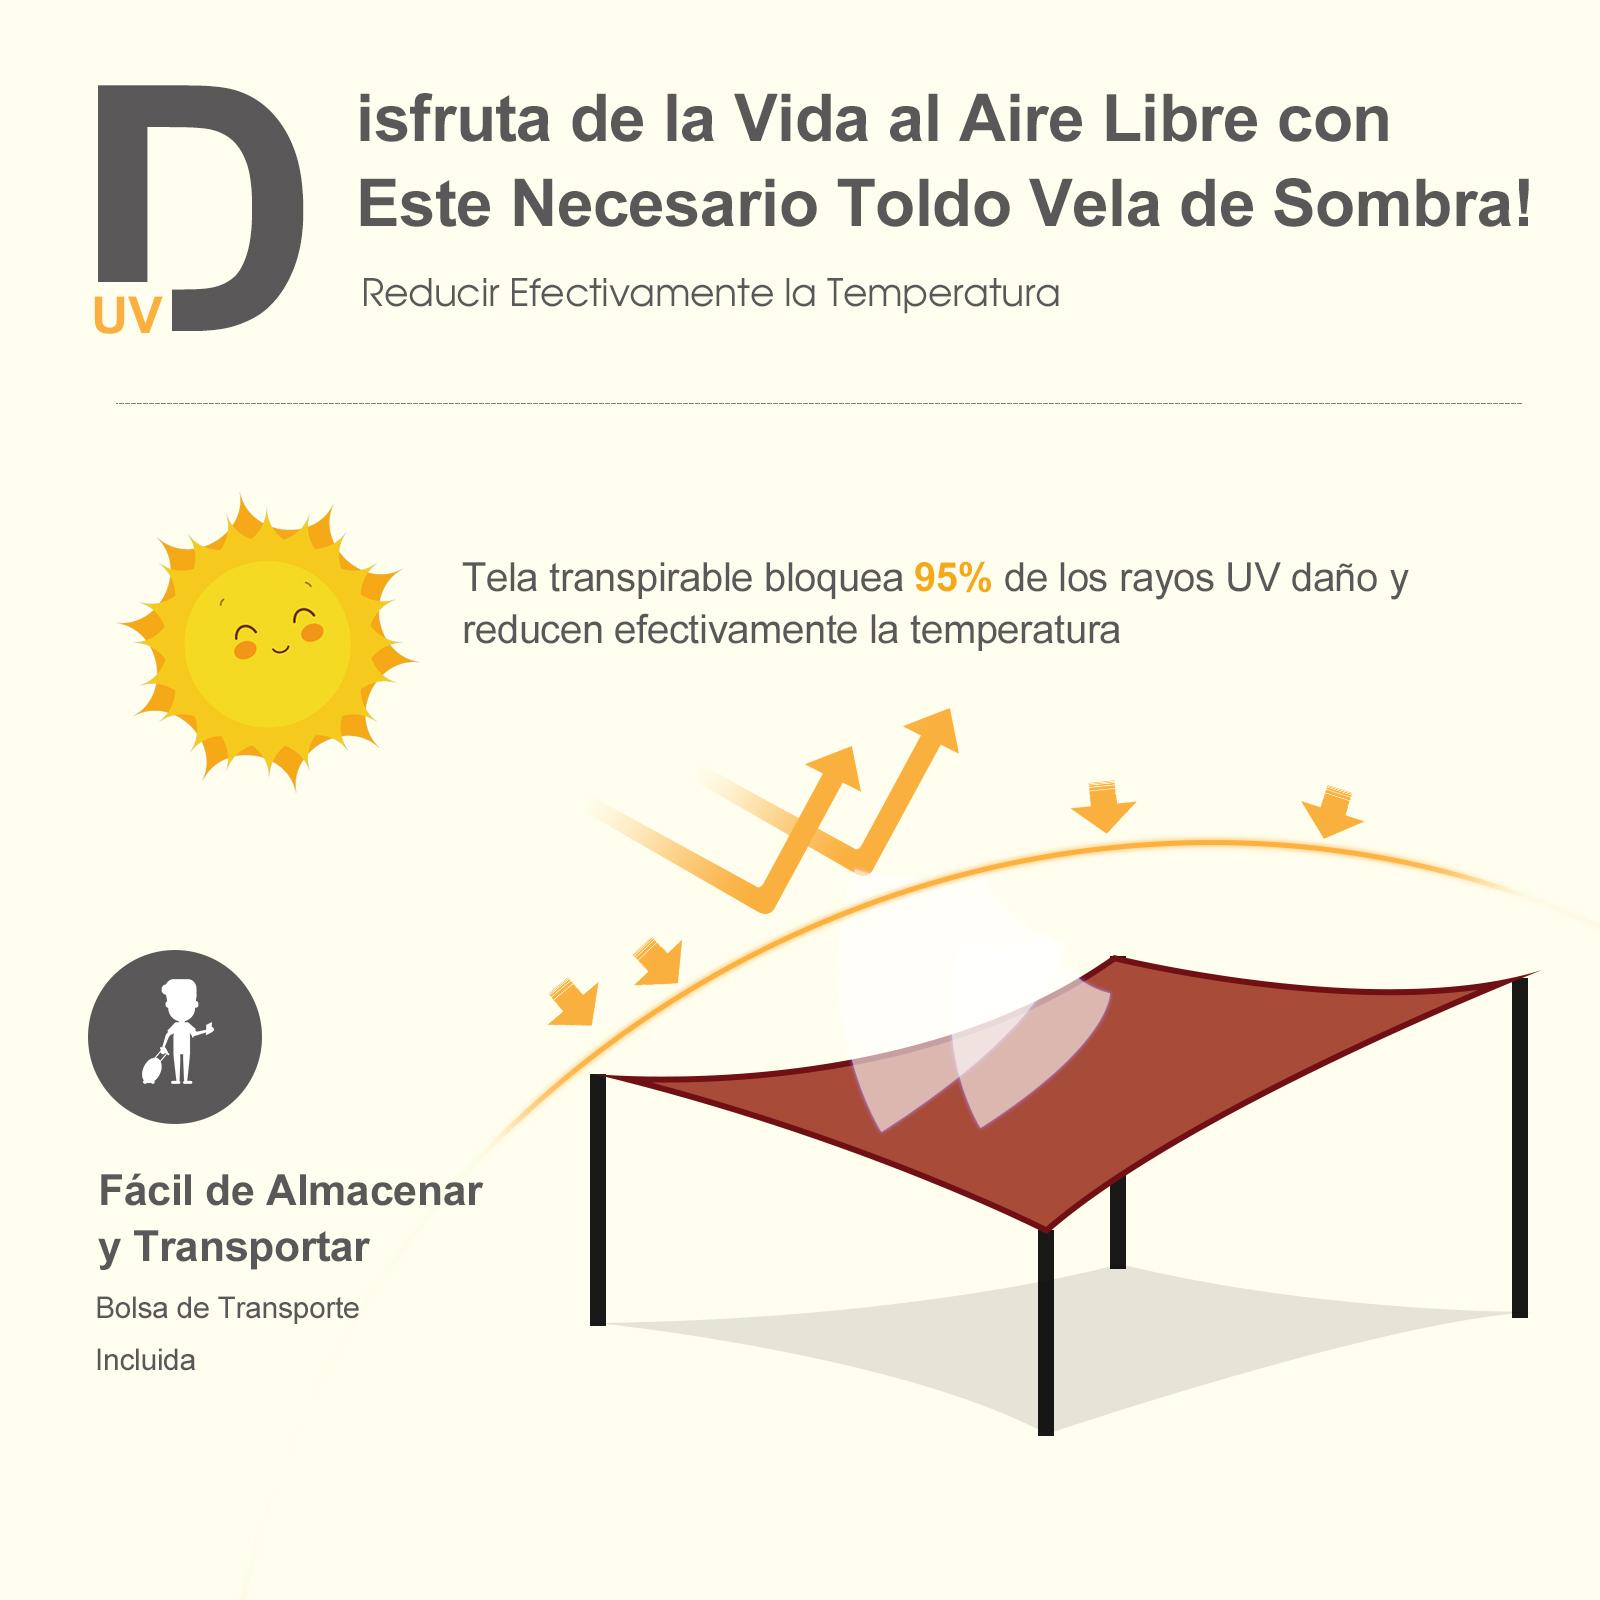 Toldo-de-Vela-Rectangular-para-Jardin-y-Exterior-Repelente-al-Agua-Proteccion-UV miniatura 22